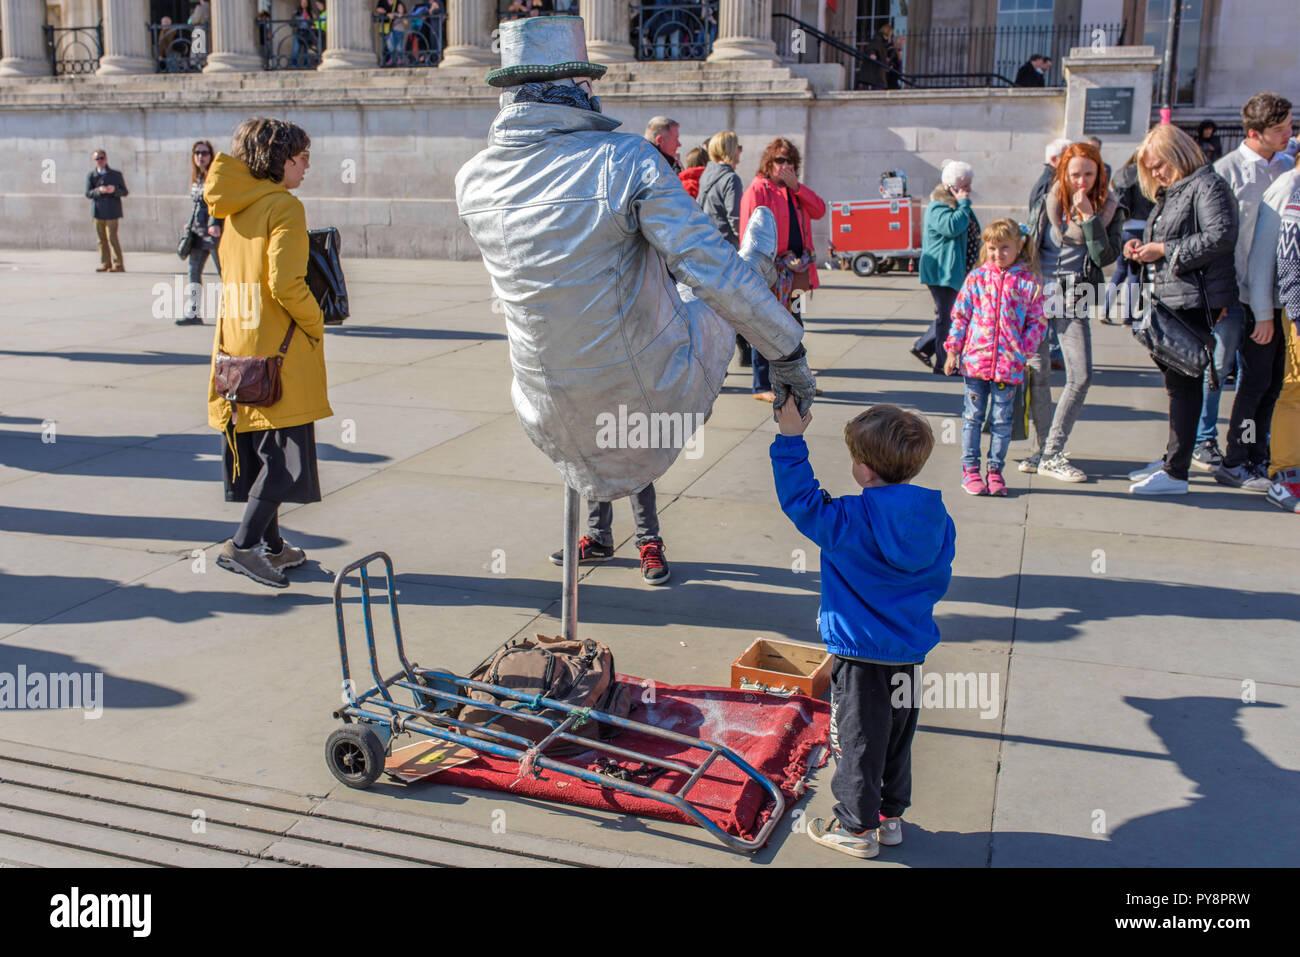 Man painted as a silver human statue in Trafalgar Square, London, England, UK. - Stock Image